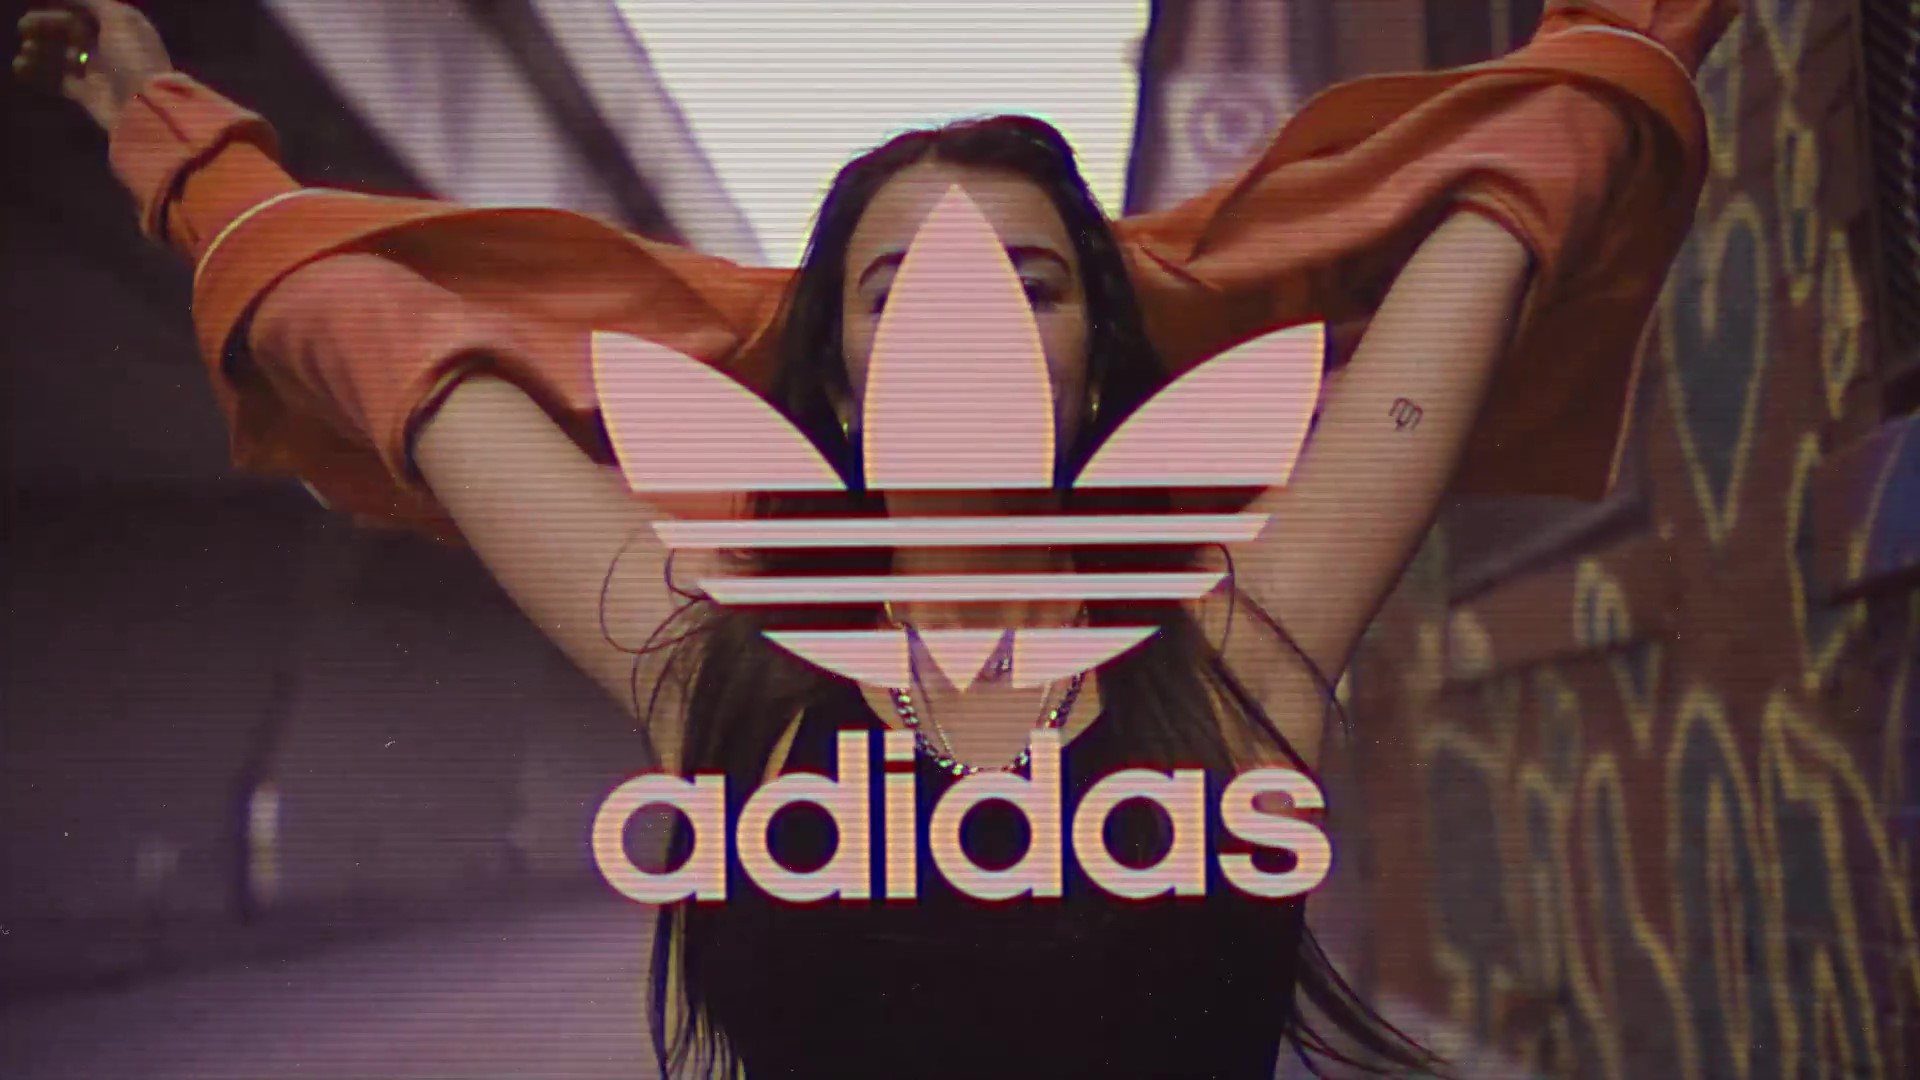 Adidas Video Advertisement Concept